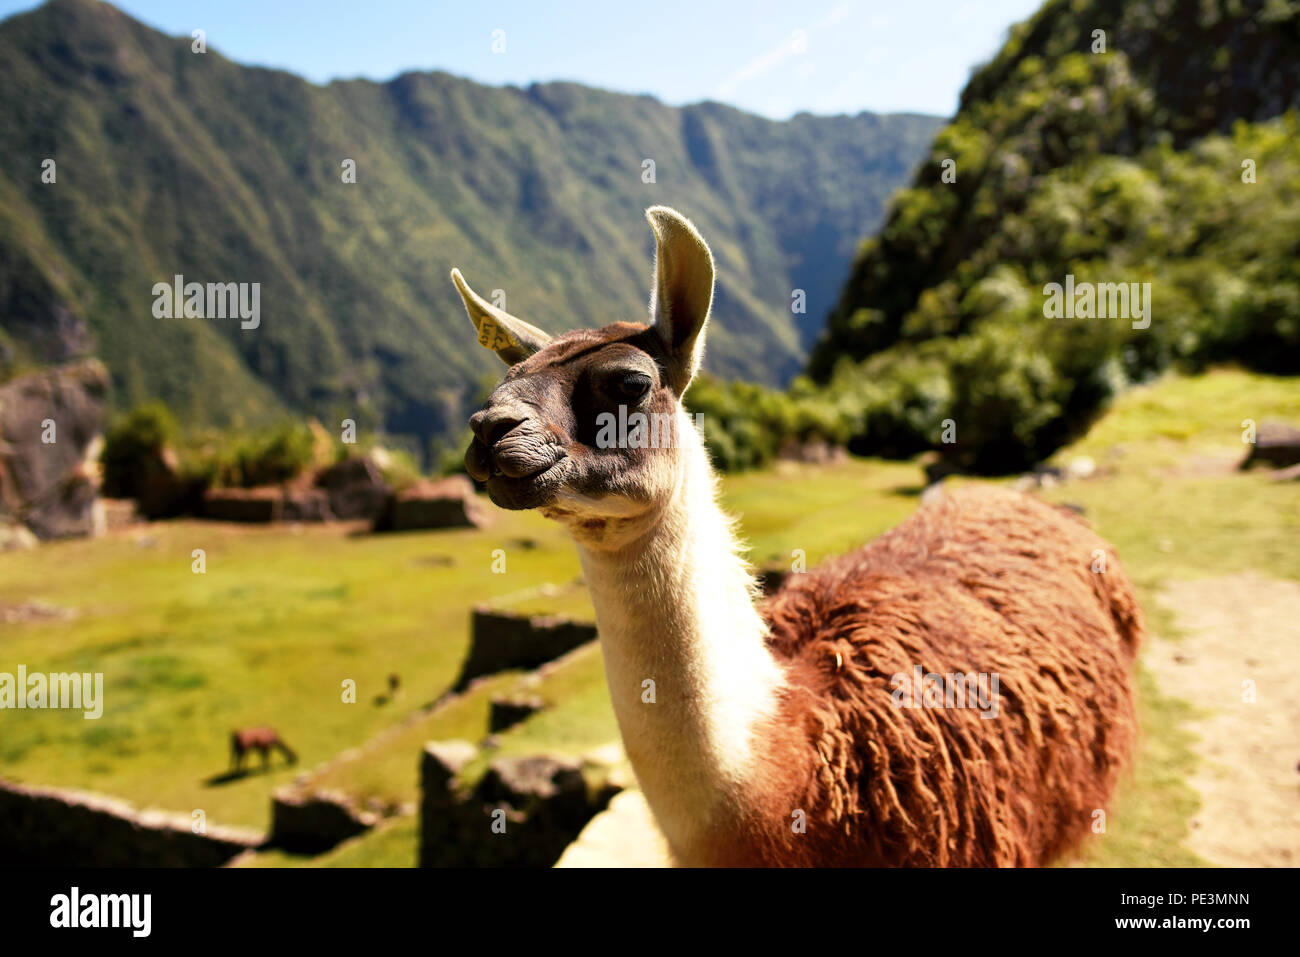 Llama looking sideways at Machu Picchu. Llamas can be used as guard animals for livestock like alpacas and sheep. Cuzco region, Peru. Jul 2018 - Stock Image